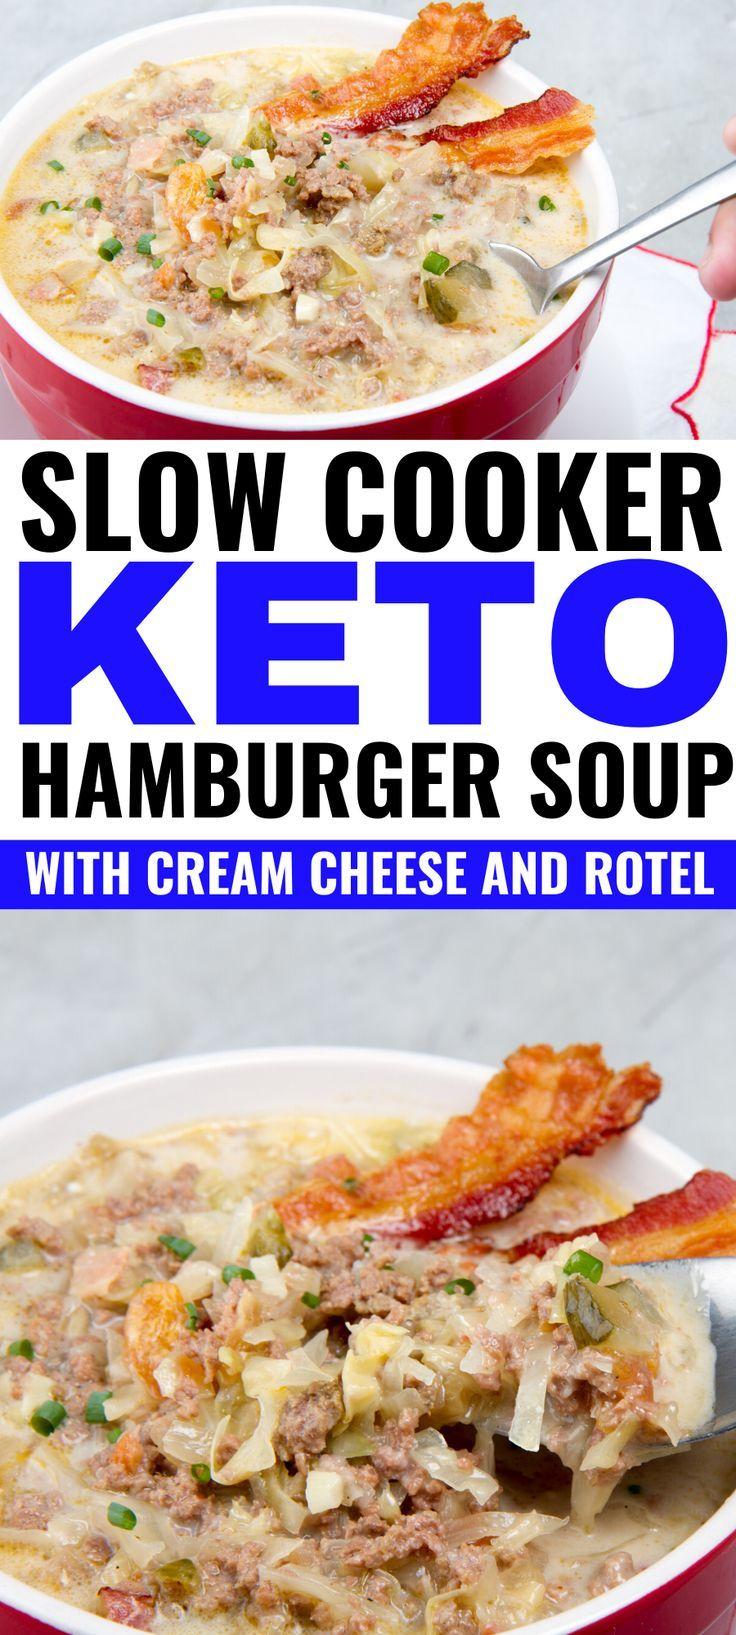 Slow Cooker Keto Hamburger Soup With Cream Cheese And Rotel Recipe Hamburger Soup